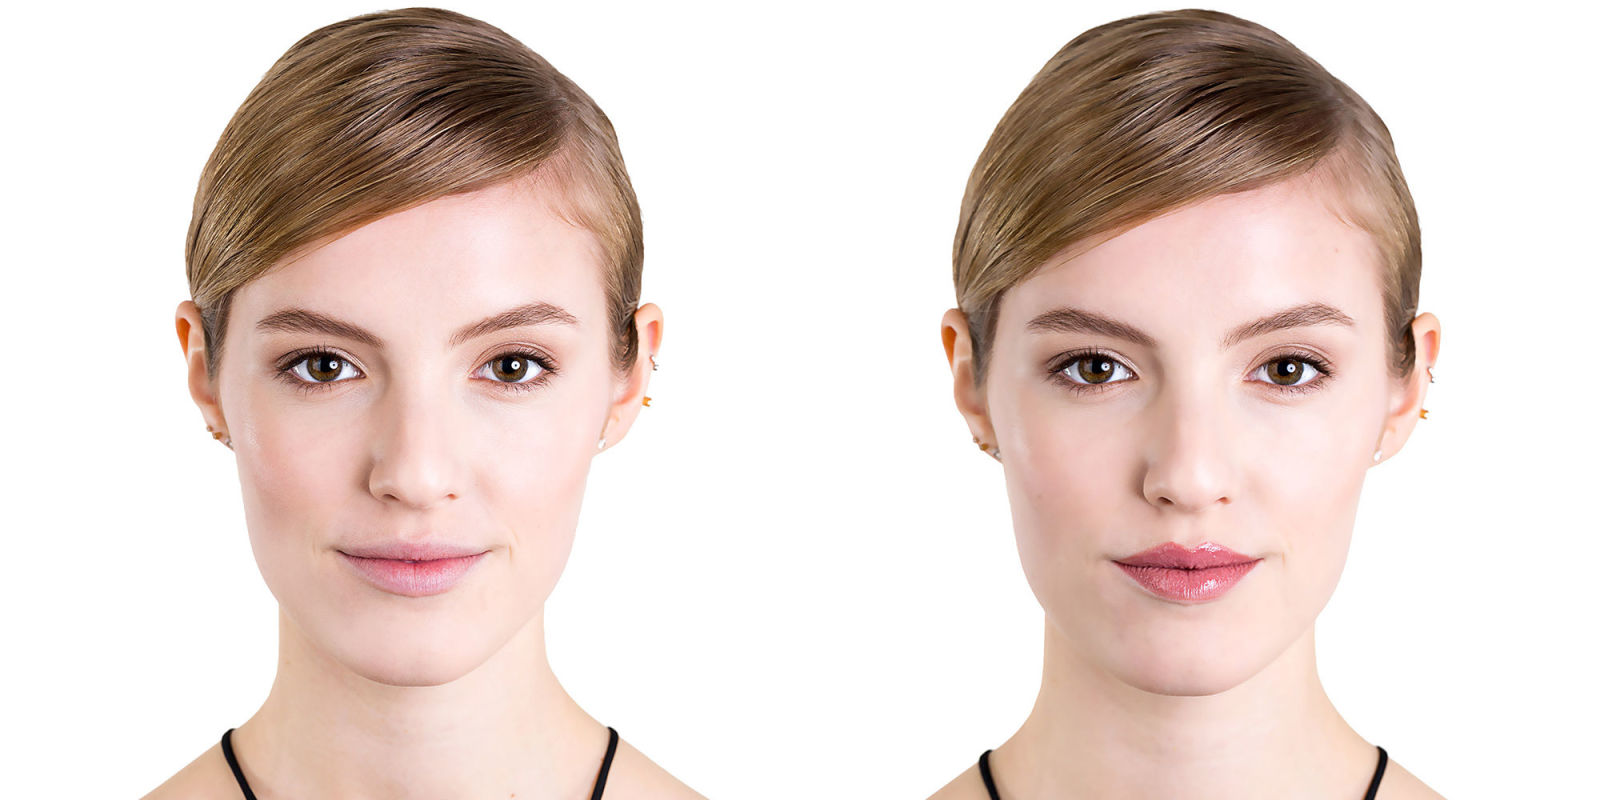 How to Get Fuller Lips